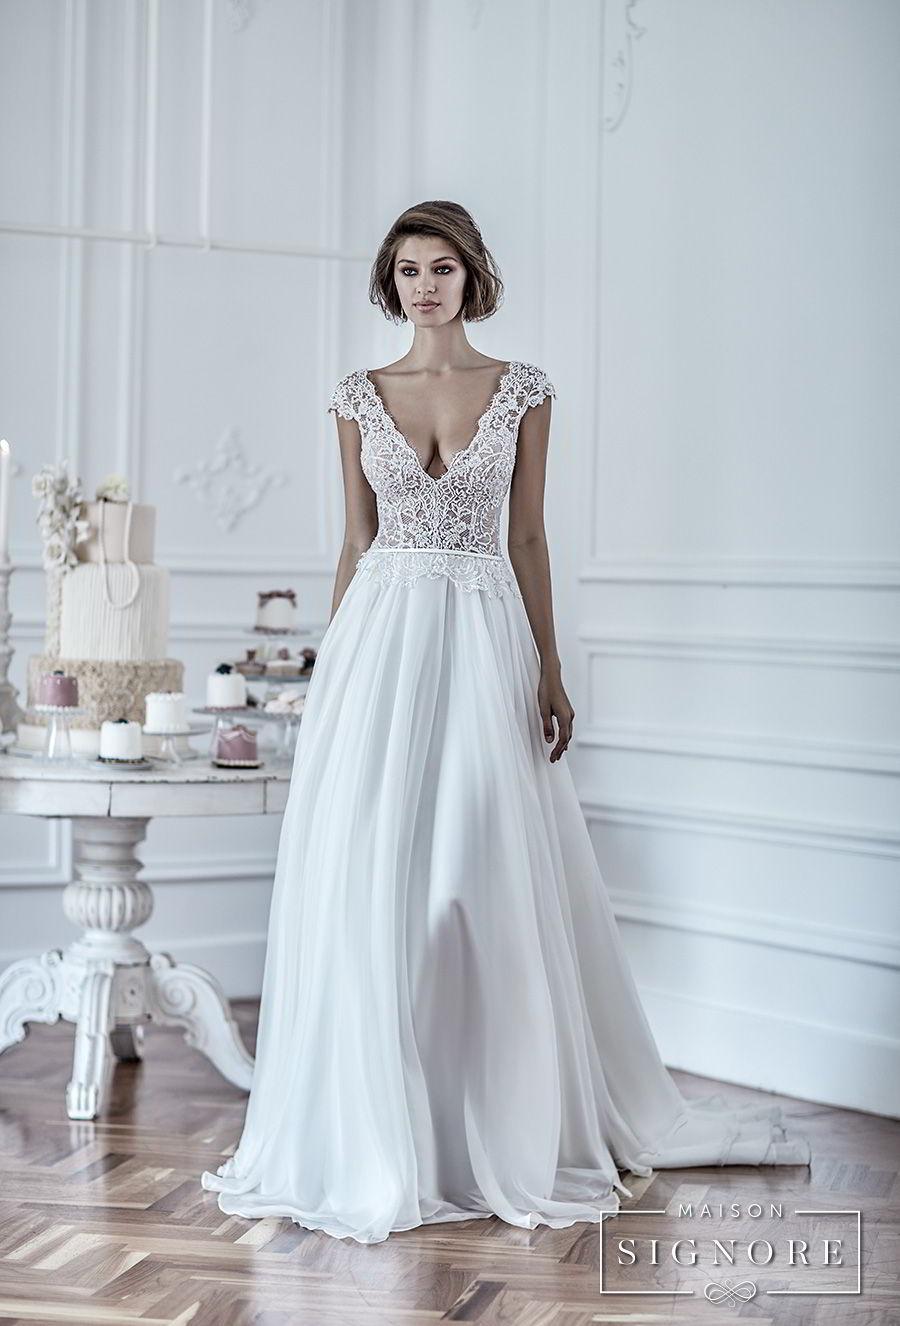 Maison Signore\'s Stunning 2018 Wedding Dresses - crazyforus